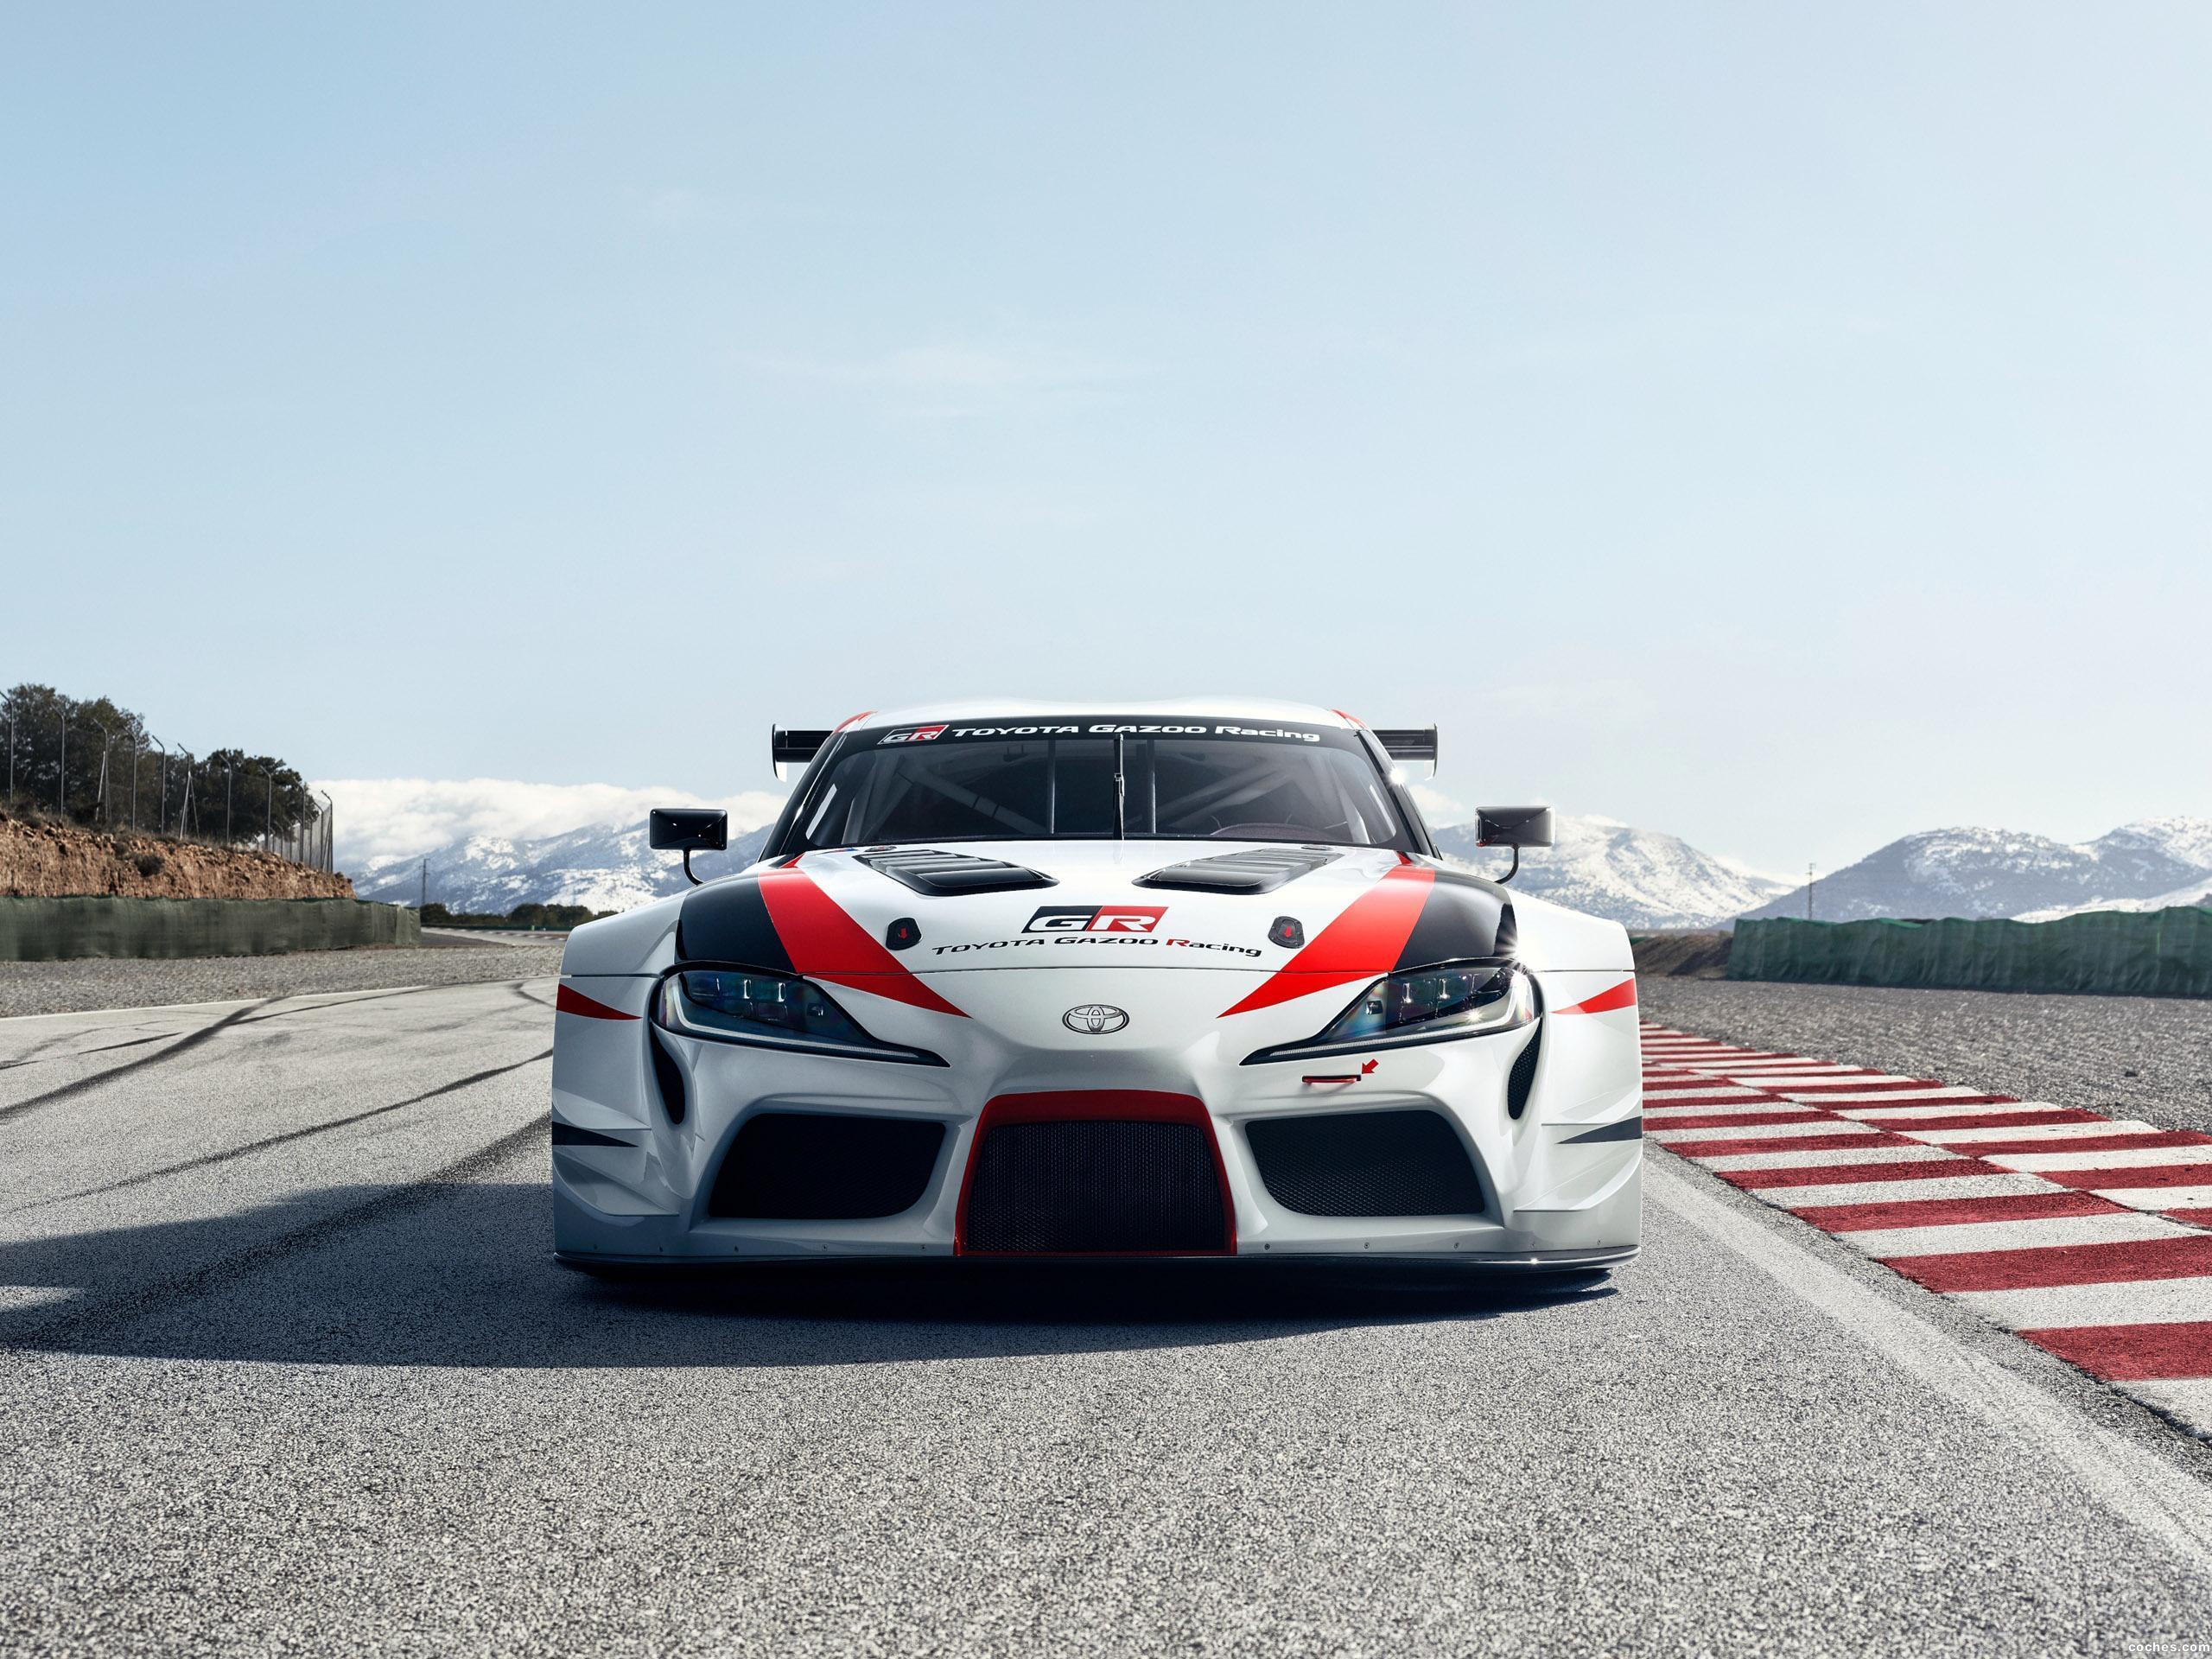 Foto 2 de Toyota GR Supra Racing Concept 2018